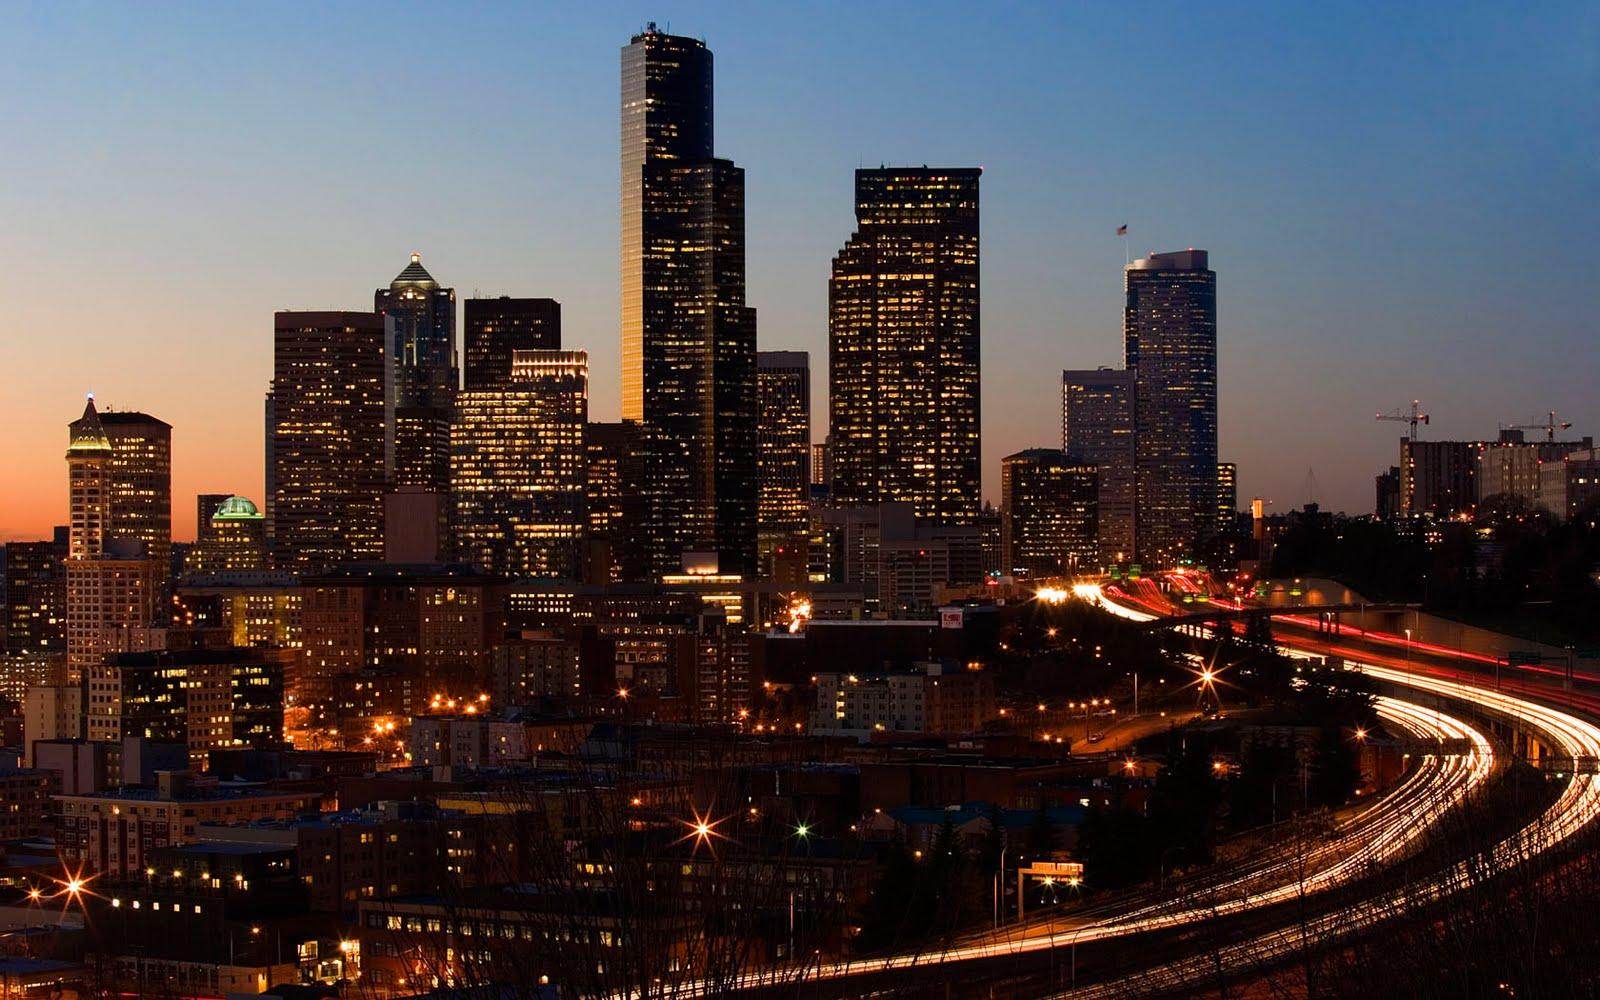 Best wallpaper night city lights wallpapers - Night light city wallpaper ...